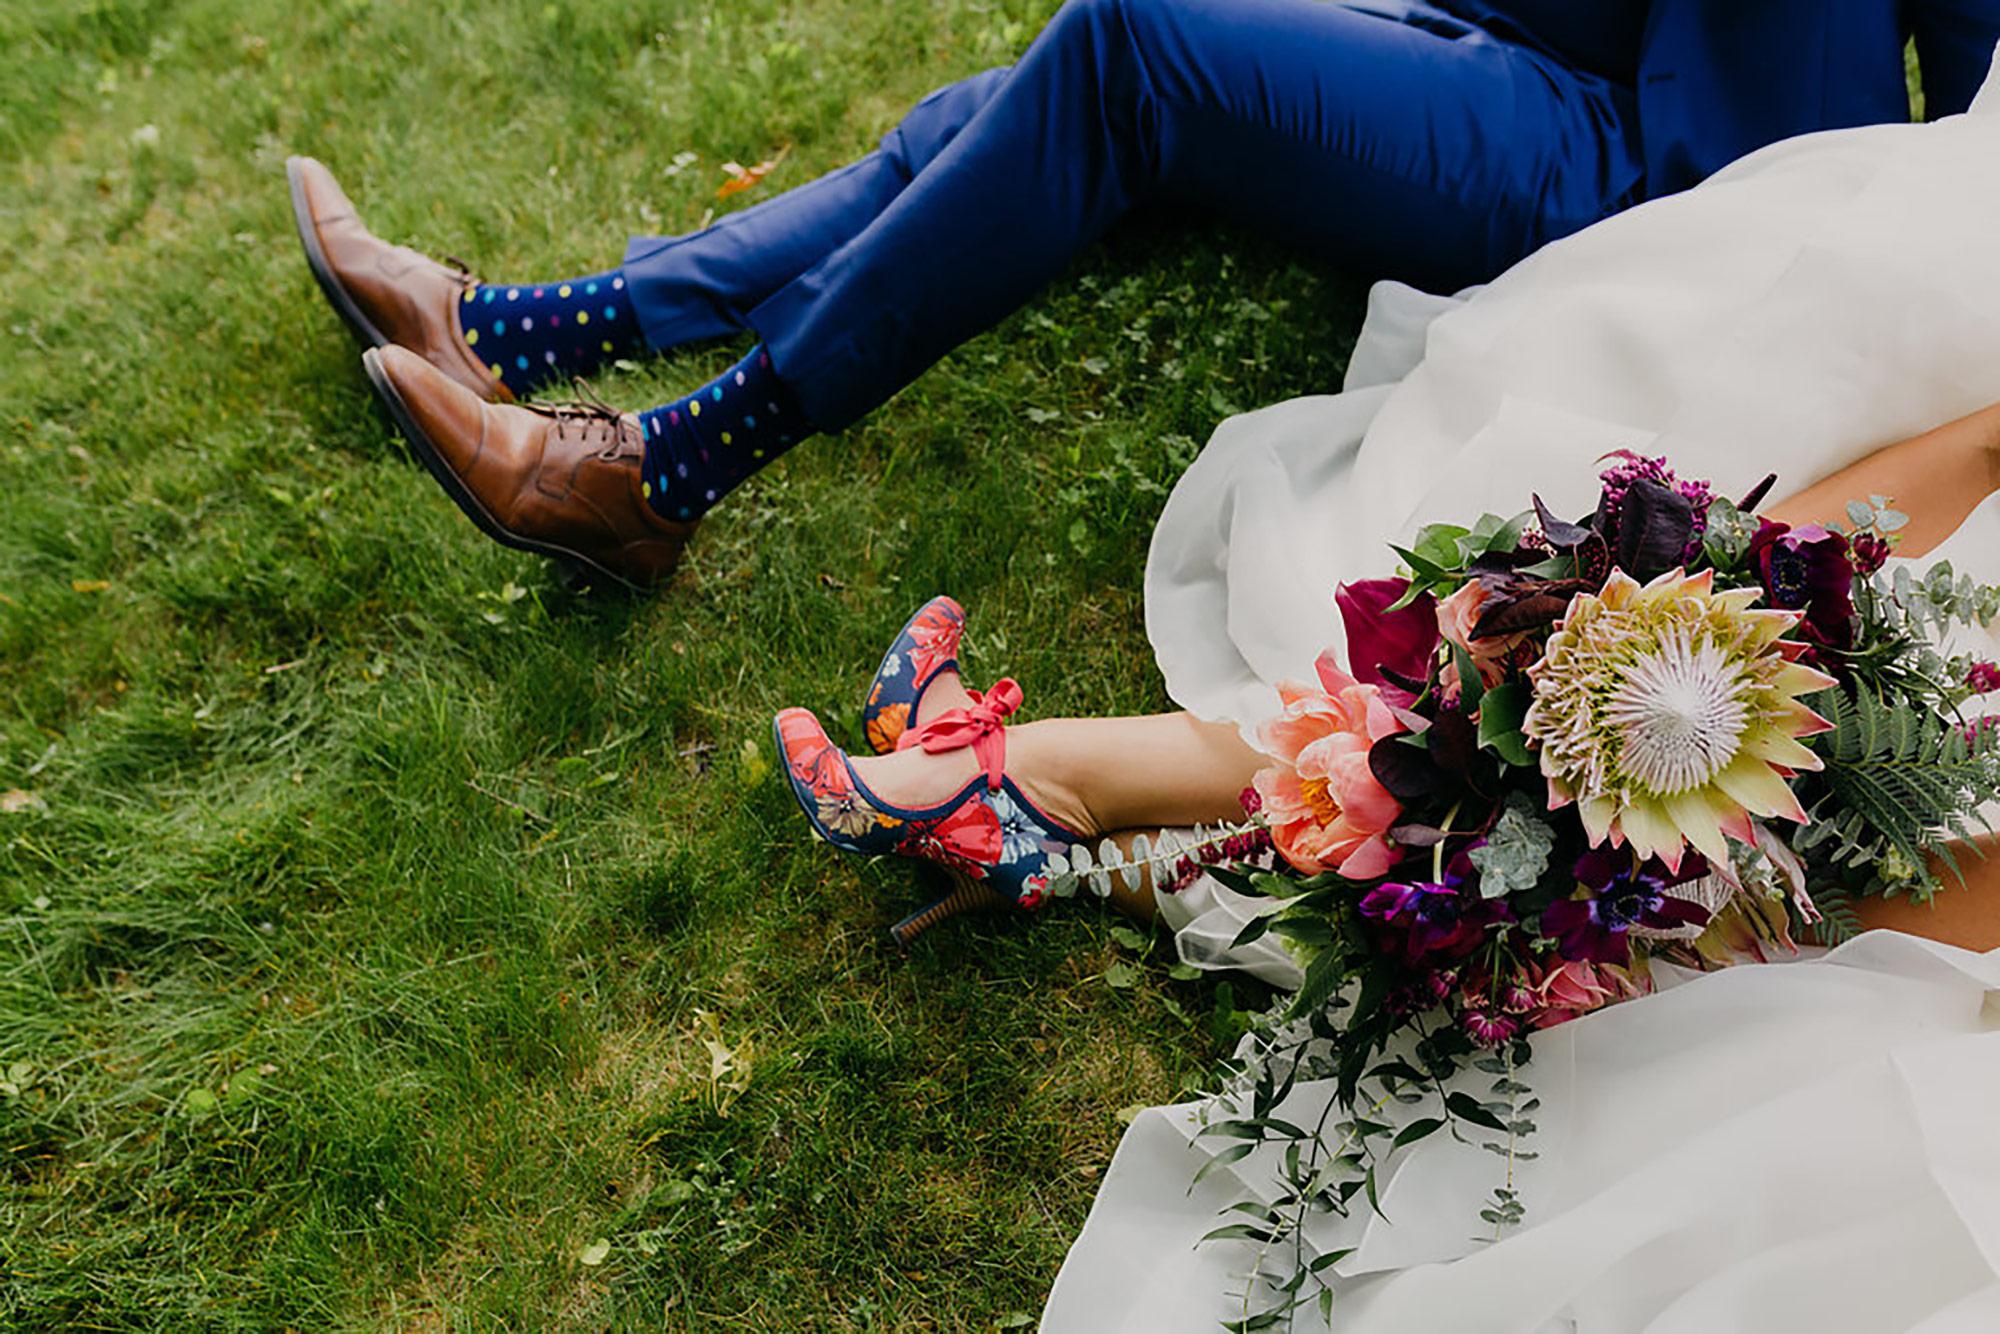 Kurtz-Orchards-Wedding-Niagara-wedding-Vineyard-Bride-Photography-by-Kayla-Rocca-021.JPG